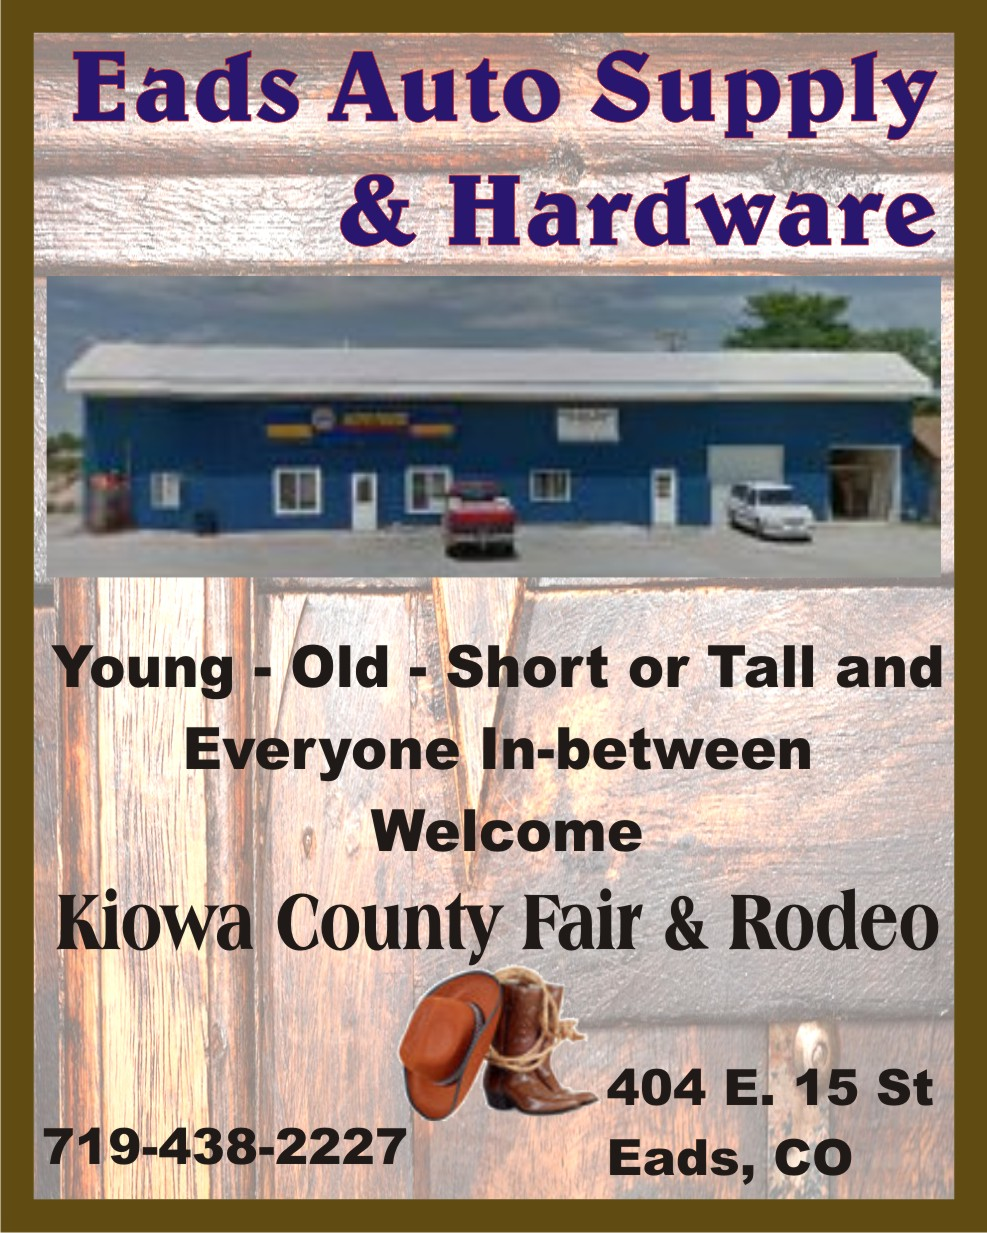 PICT 2019 Kiowa County Fair Sponsor - Eads Auto